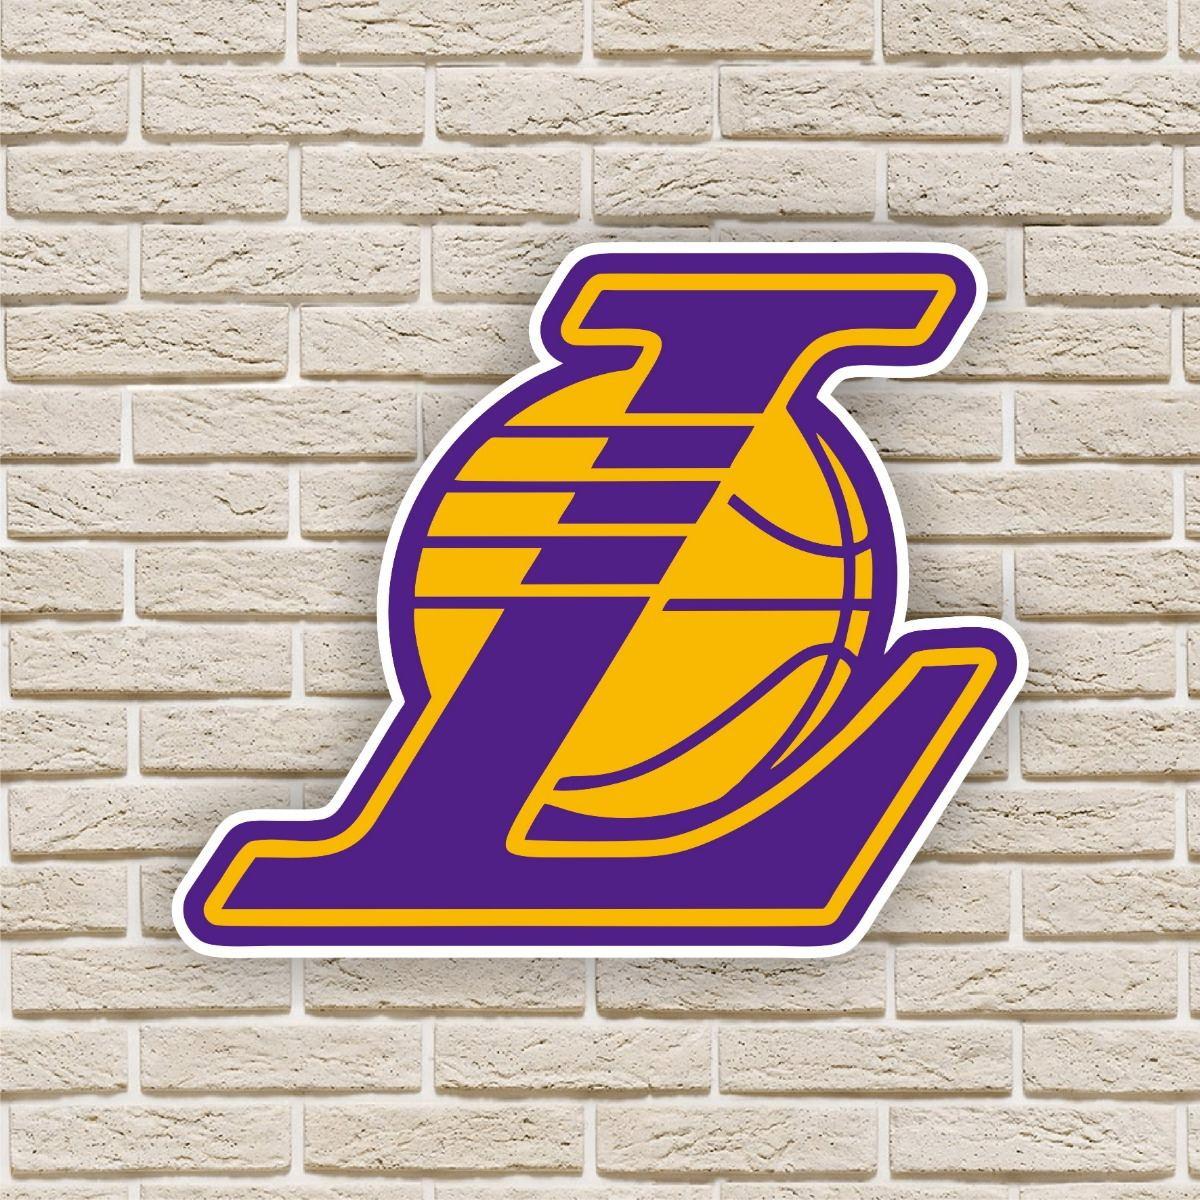 c314a3f0d Quadro Decorativo Los Angeles Lakers Nba Basquete no Elo7